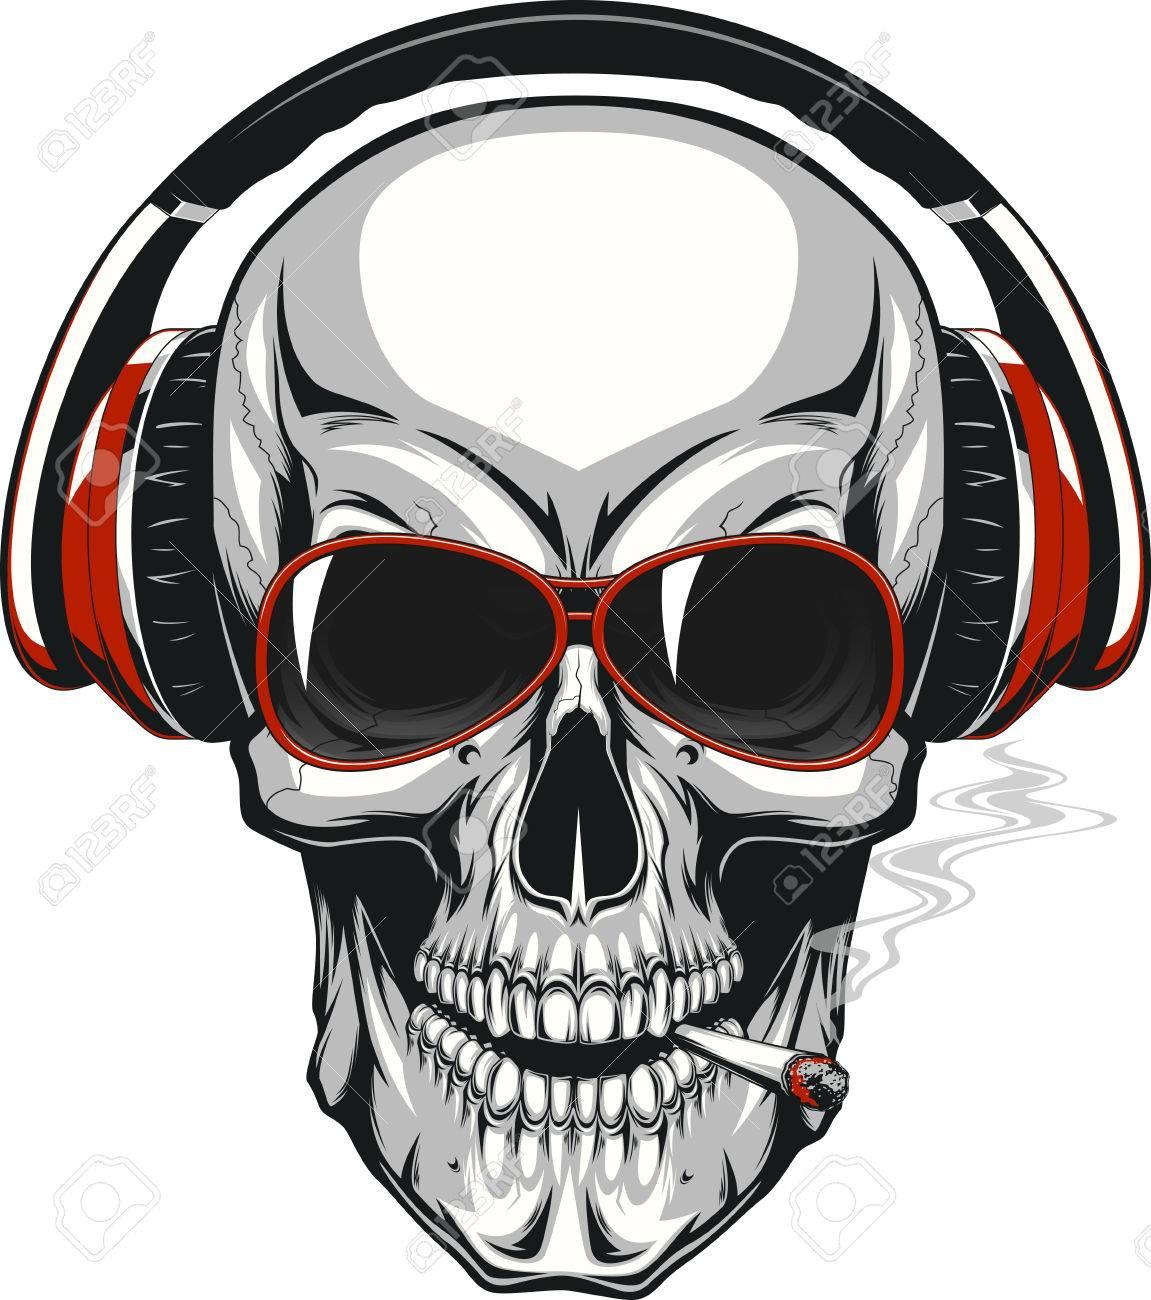 91179e4cdb2 illustration, human skull listening to music on headphones Stock Vector -  65862306